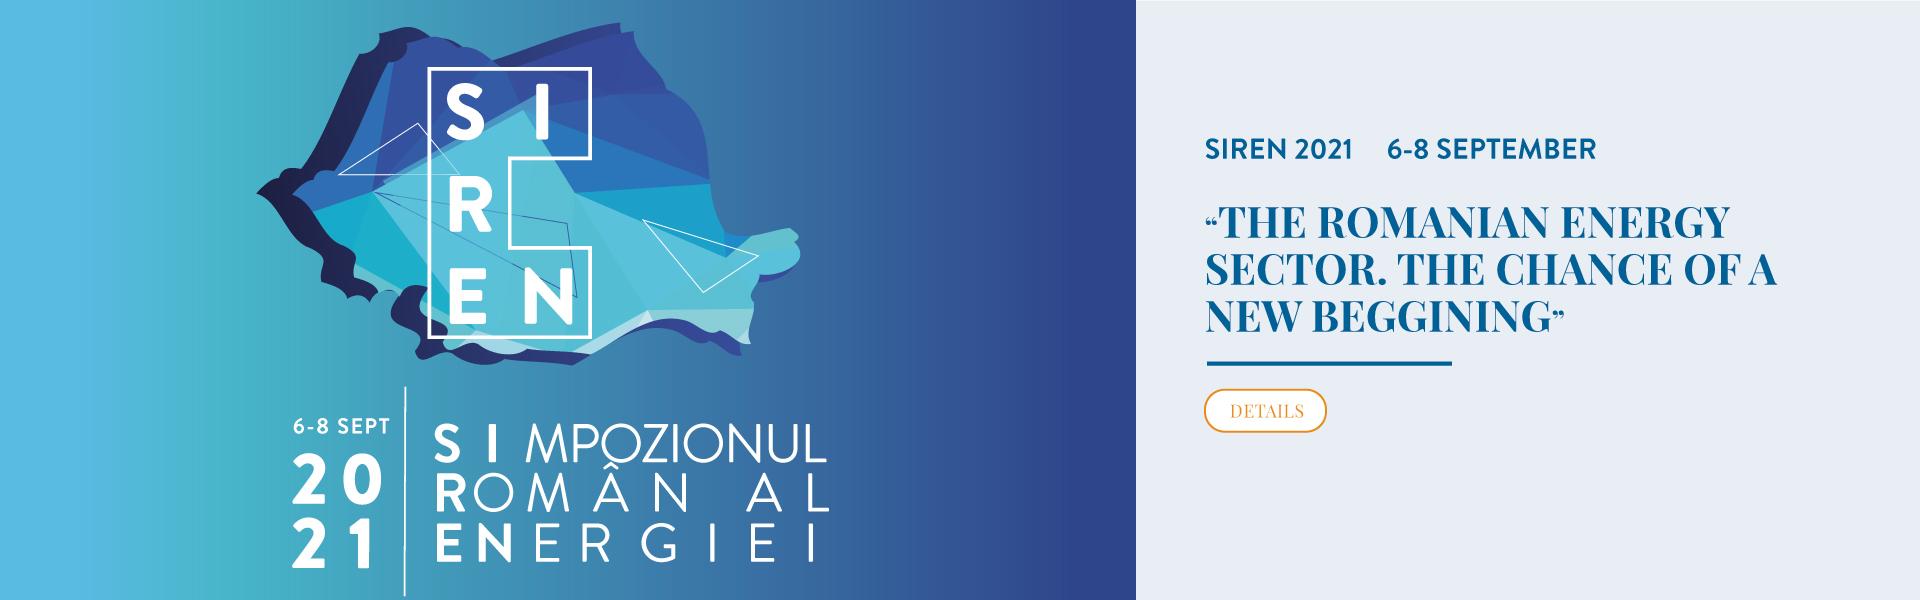 SIREN - THE ROMANIAN ENERGY SYMPOSIUM 2021